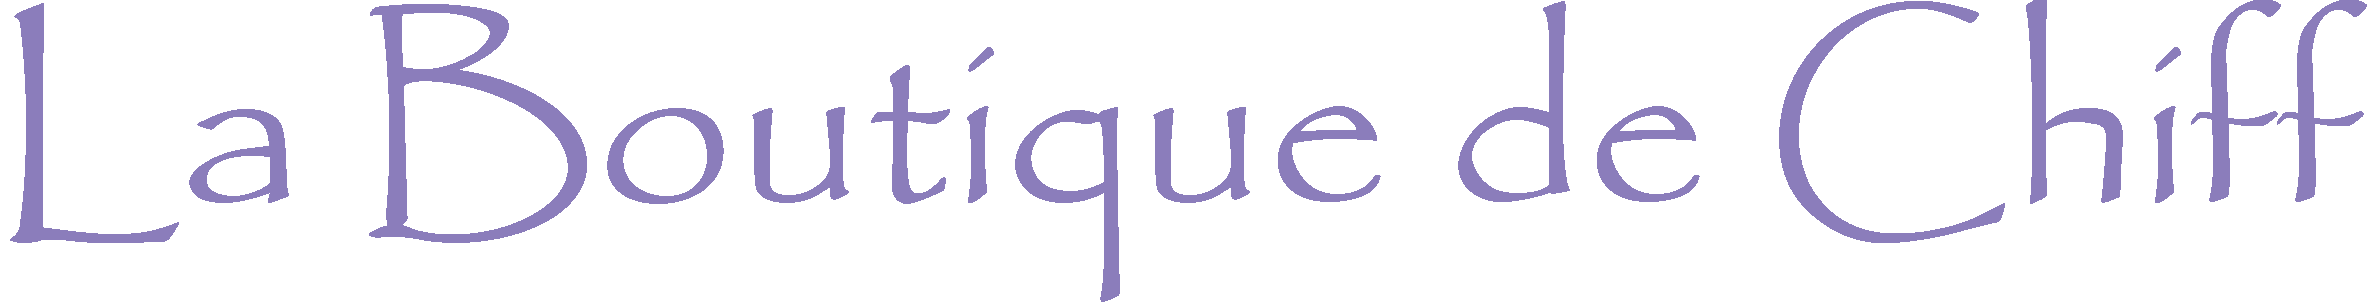 Logo-Bayaert-v2